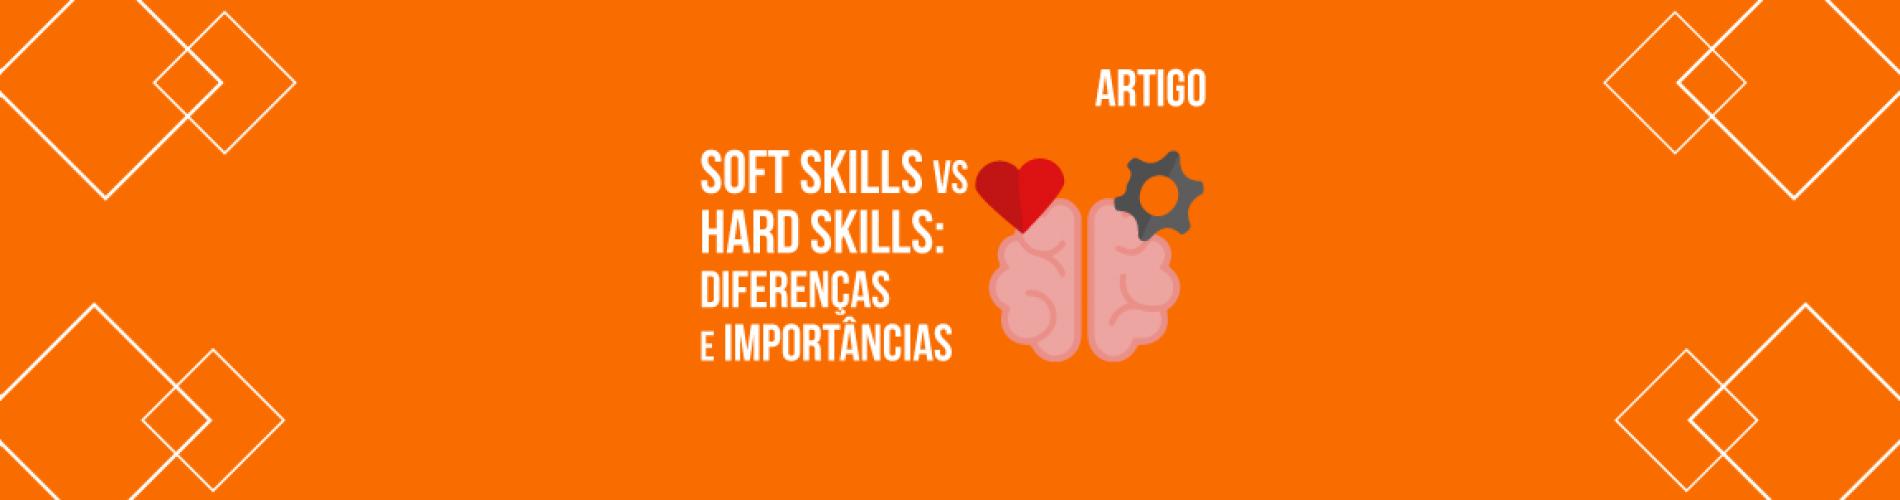 soft-skills-x-hard-skills-diferencas-e-importancias